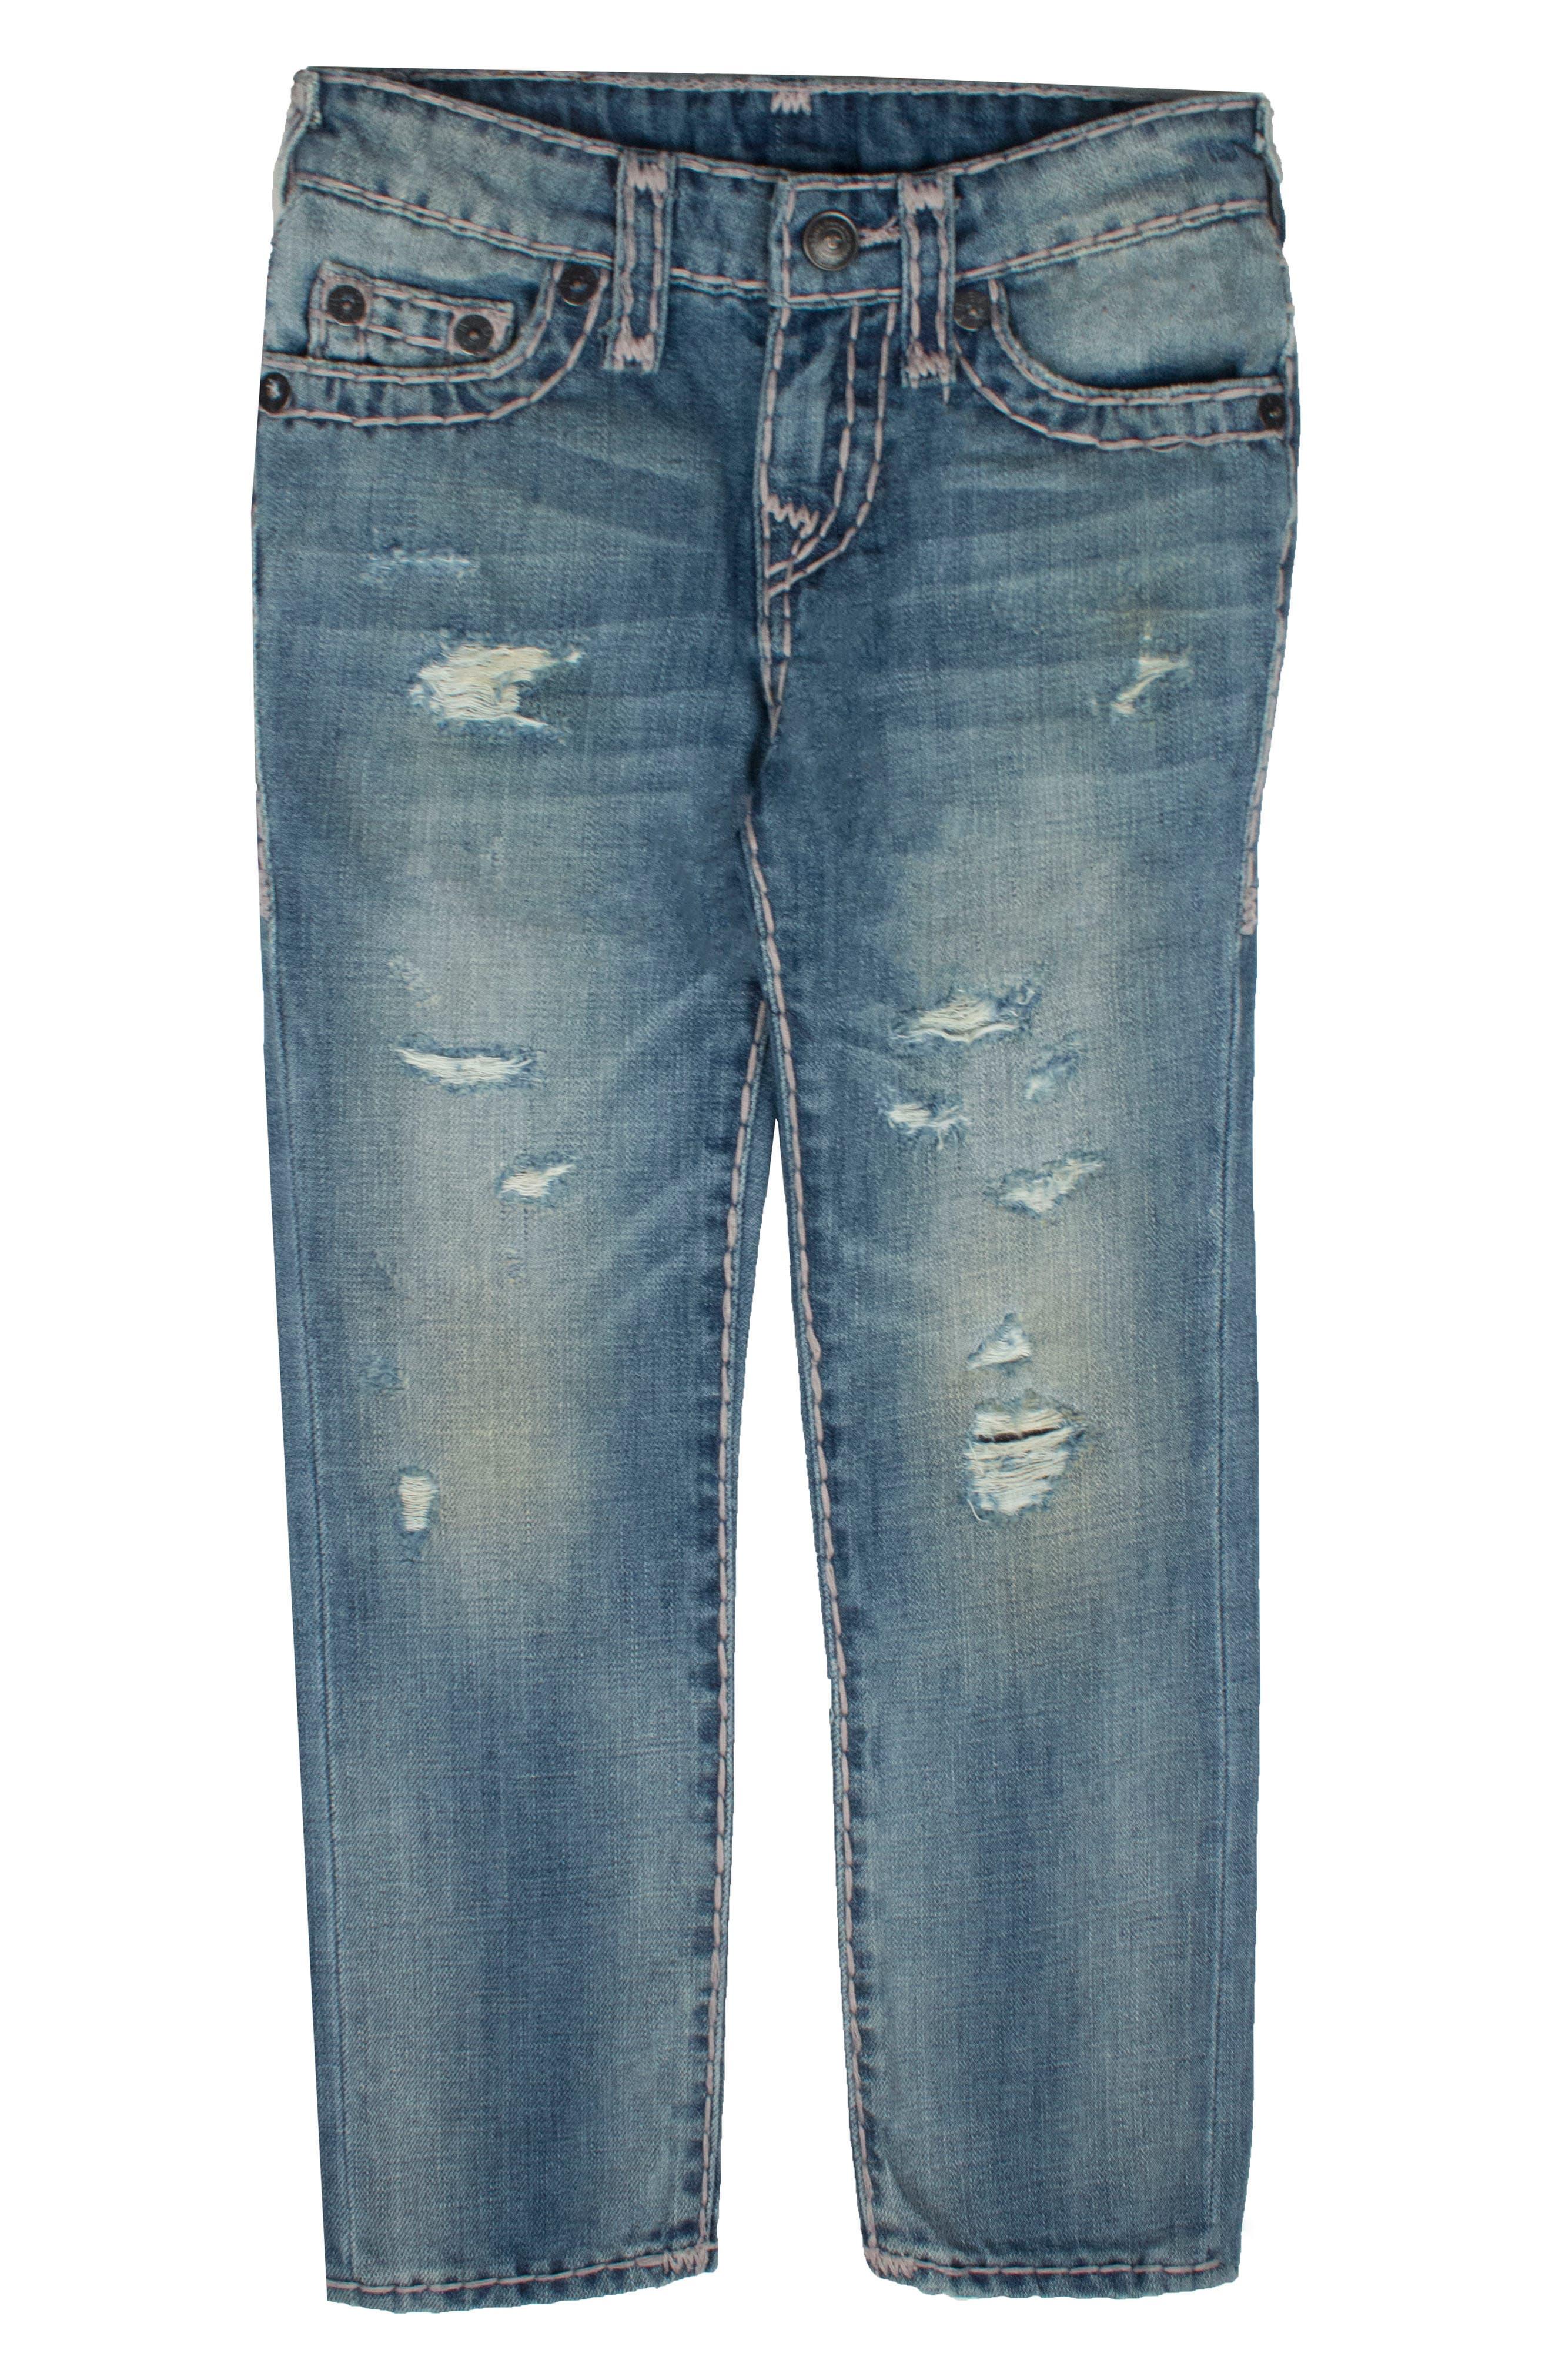 True Religion Brand Jeans Geno Super T Straight Leg Jeans (Big Boys)